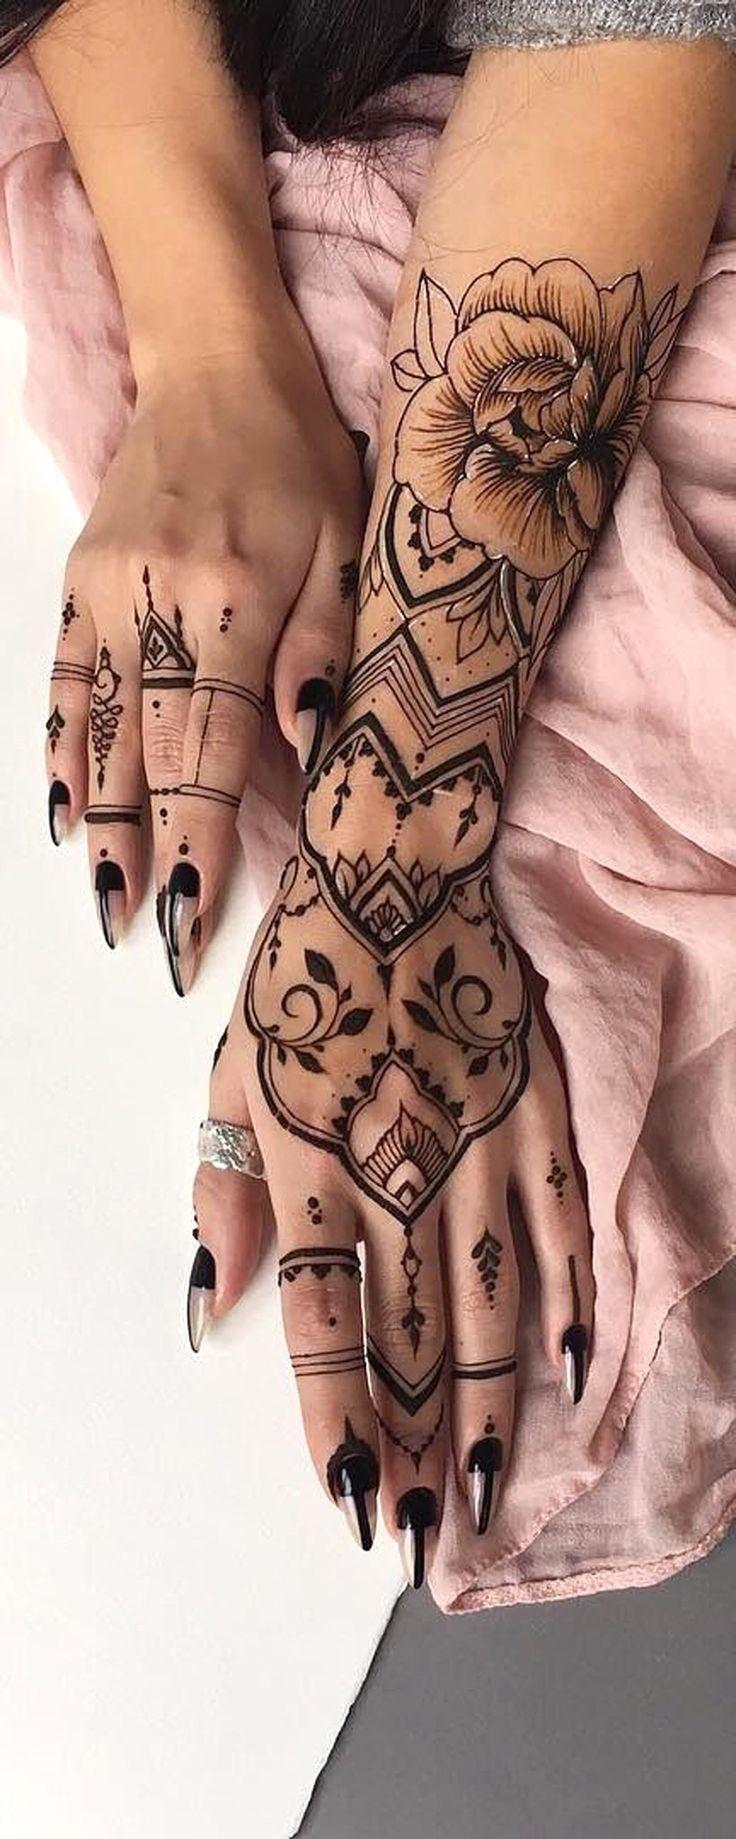 25 Simple Cute Small Henna Design Ideas | EntertainmentMesh |Realistic Rose Tattoos Henna Designs